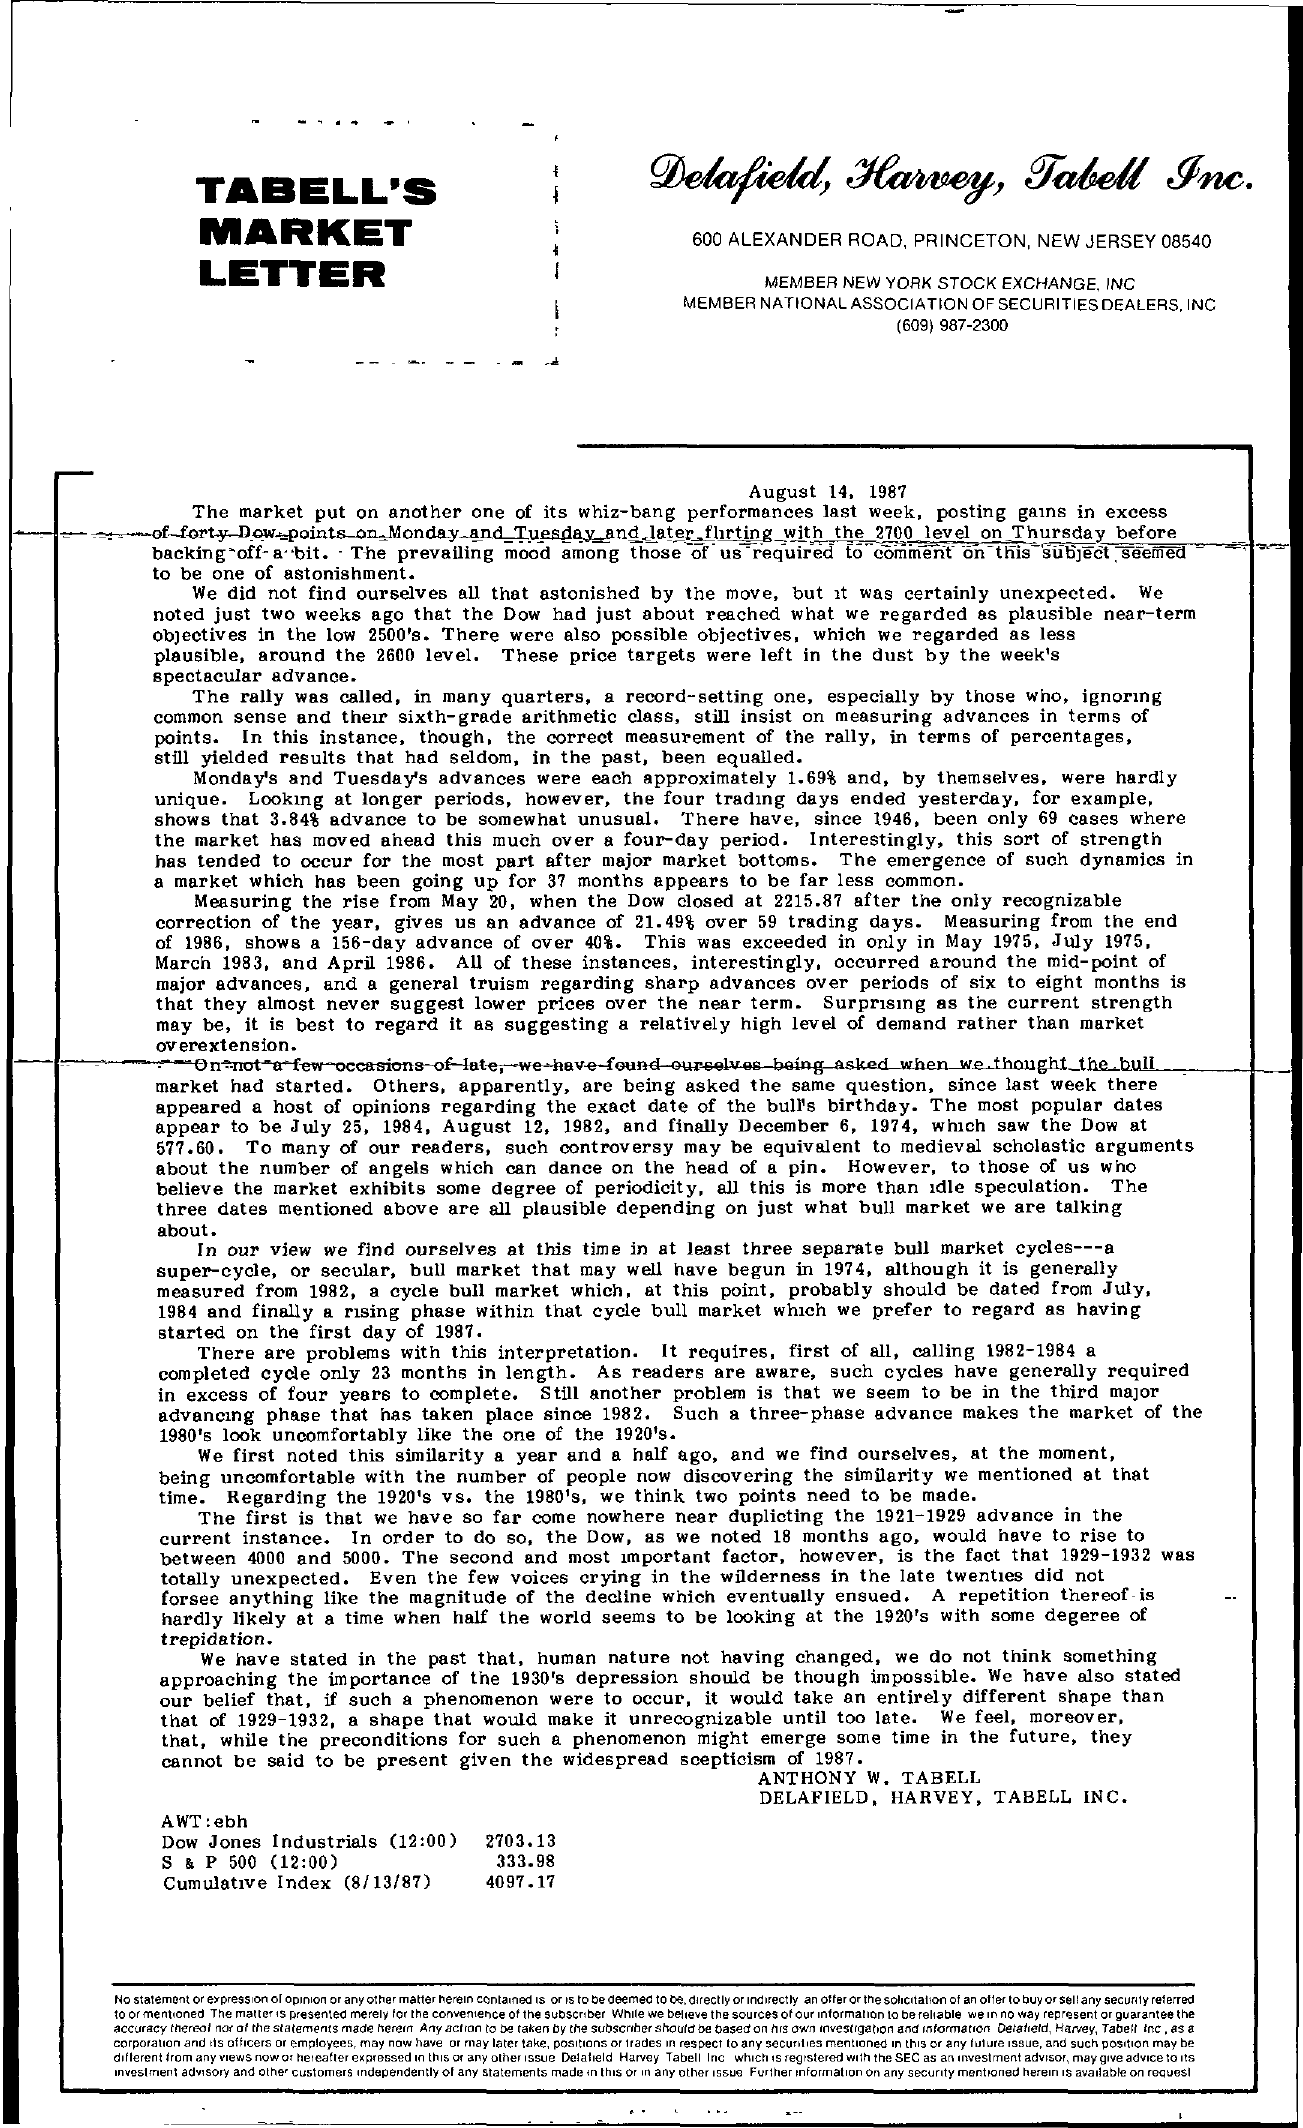 Tabell's Market Letter - August 14, 1987